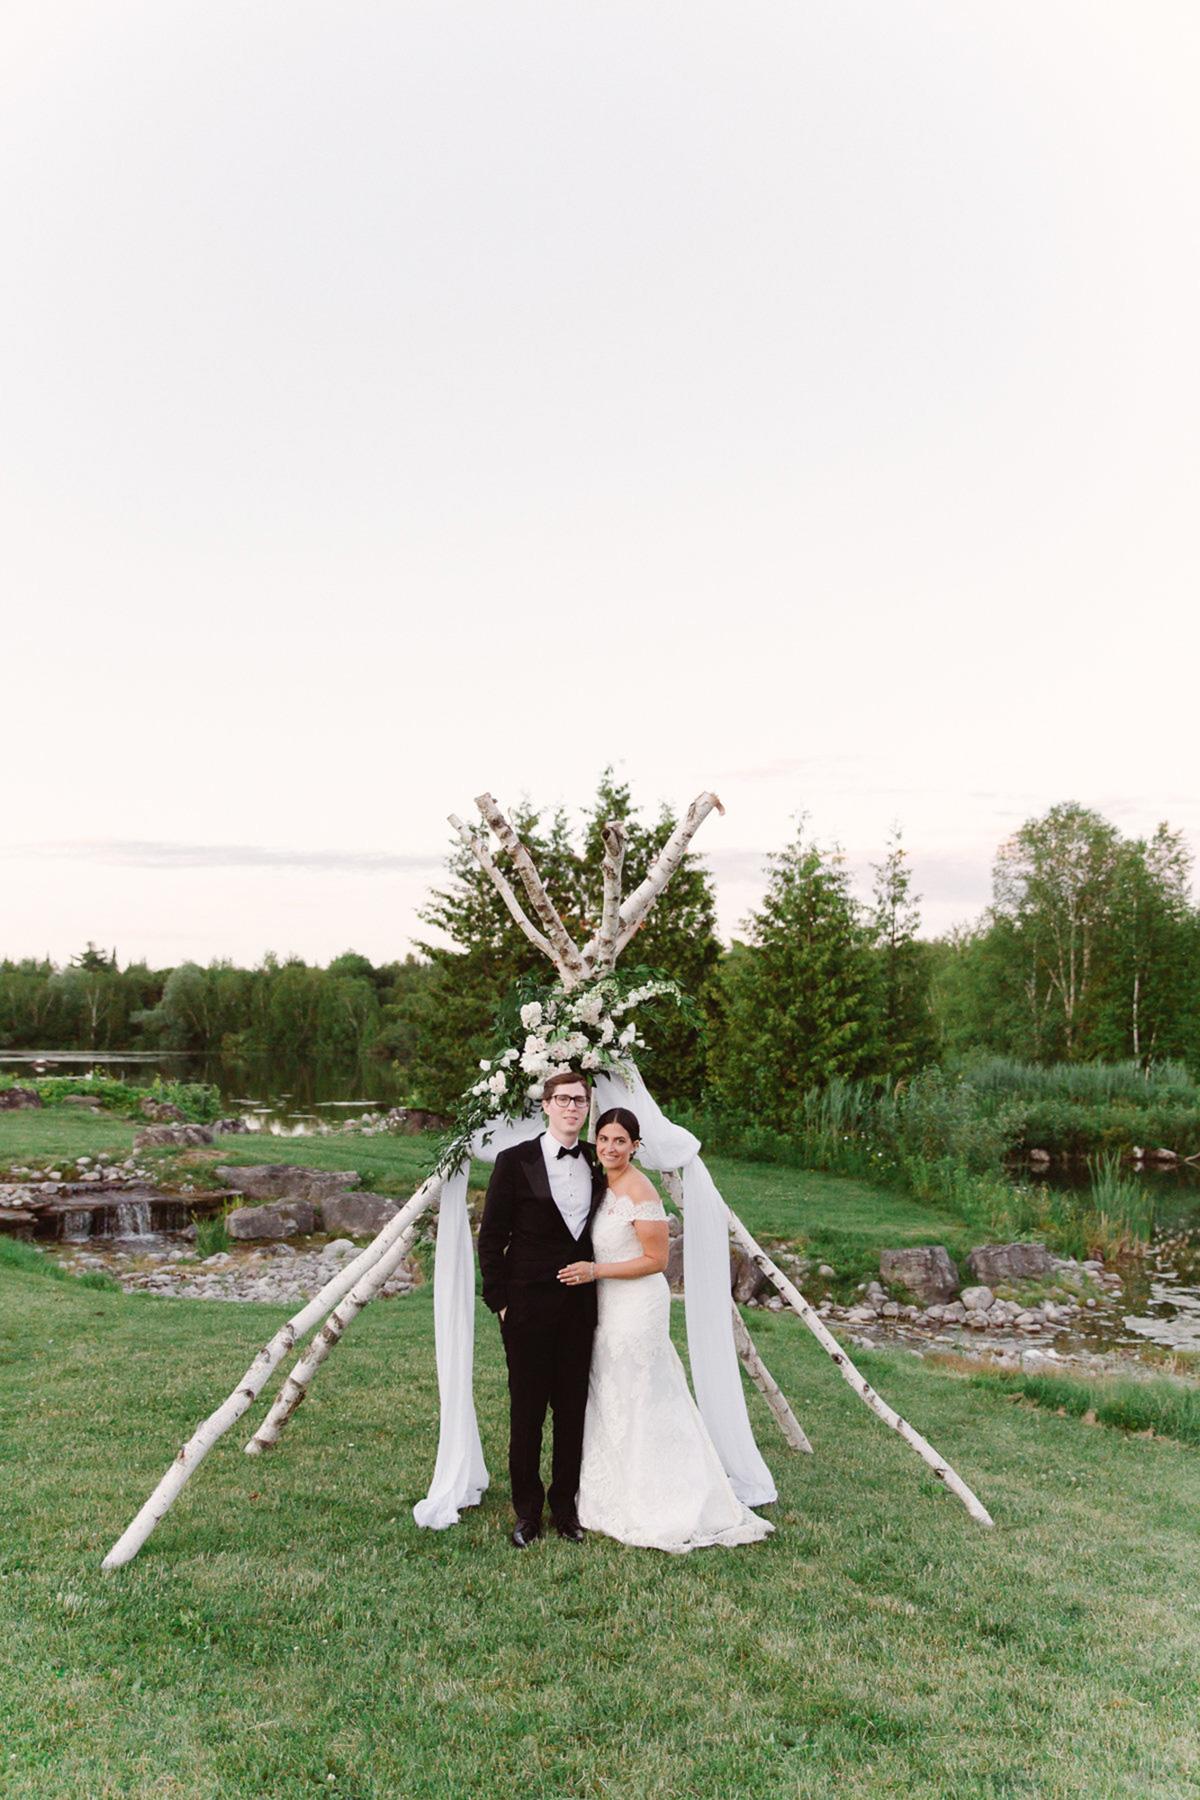 artiese-studios-vineyard-bride-swish-list-private-estate-cambridge-wedding-12.jpg